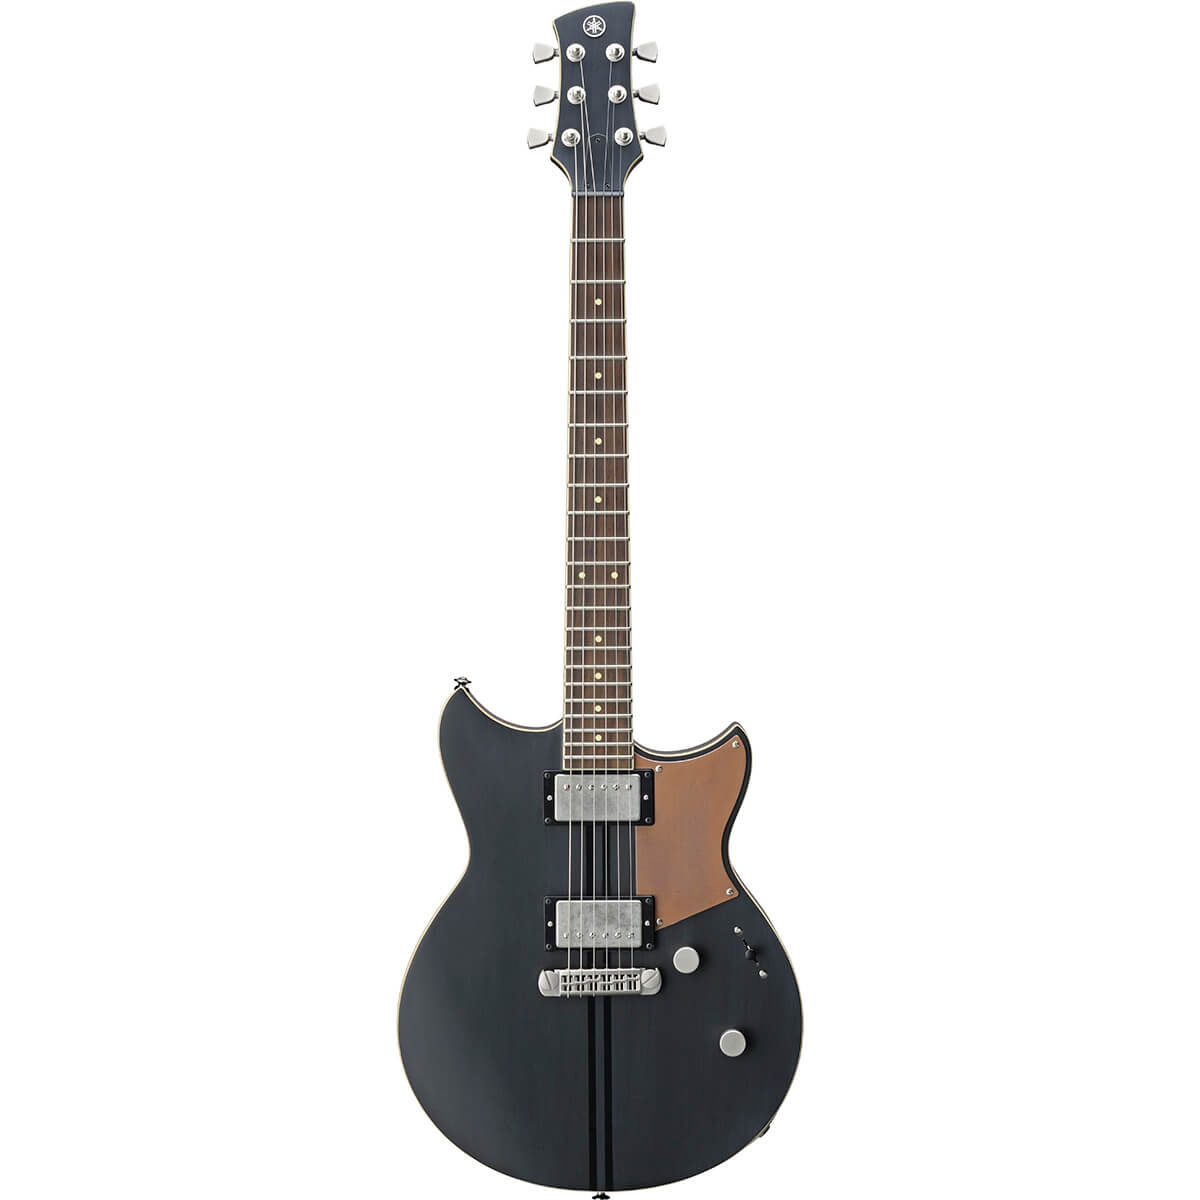 Yamaha RSP20CRBBLRevstar el-guitar brushedblack